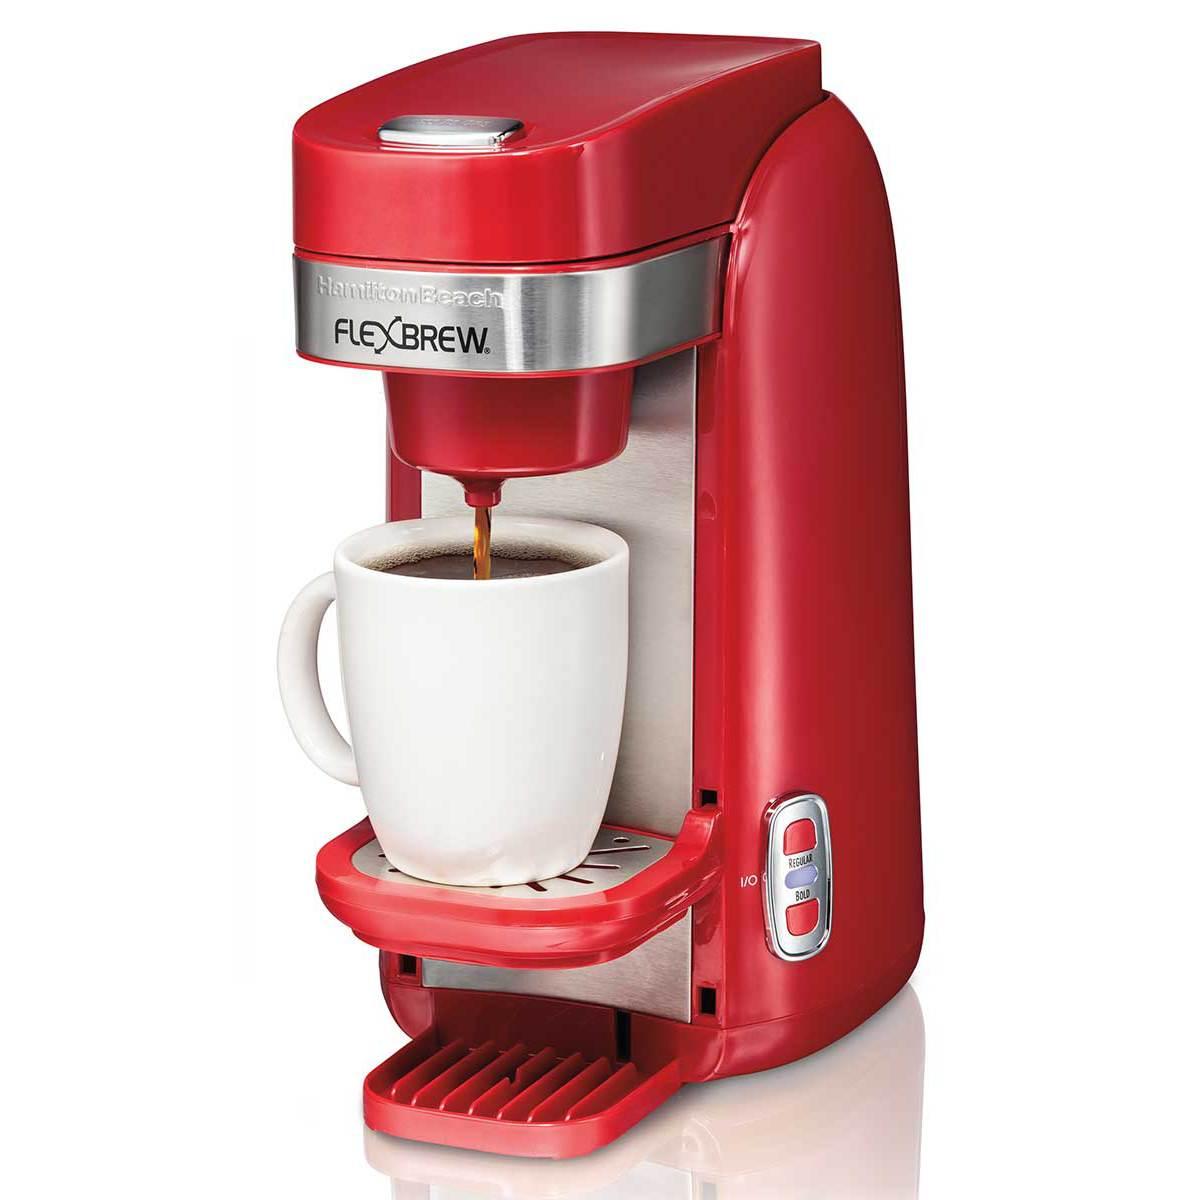 FlexBrew® Single-Serve Coffee Maker, Red (49960)